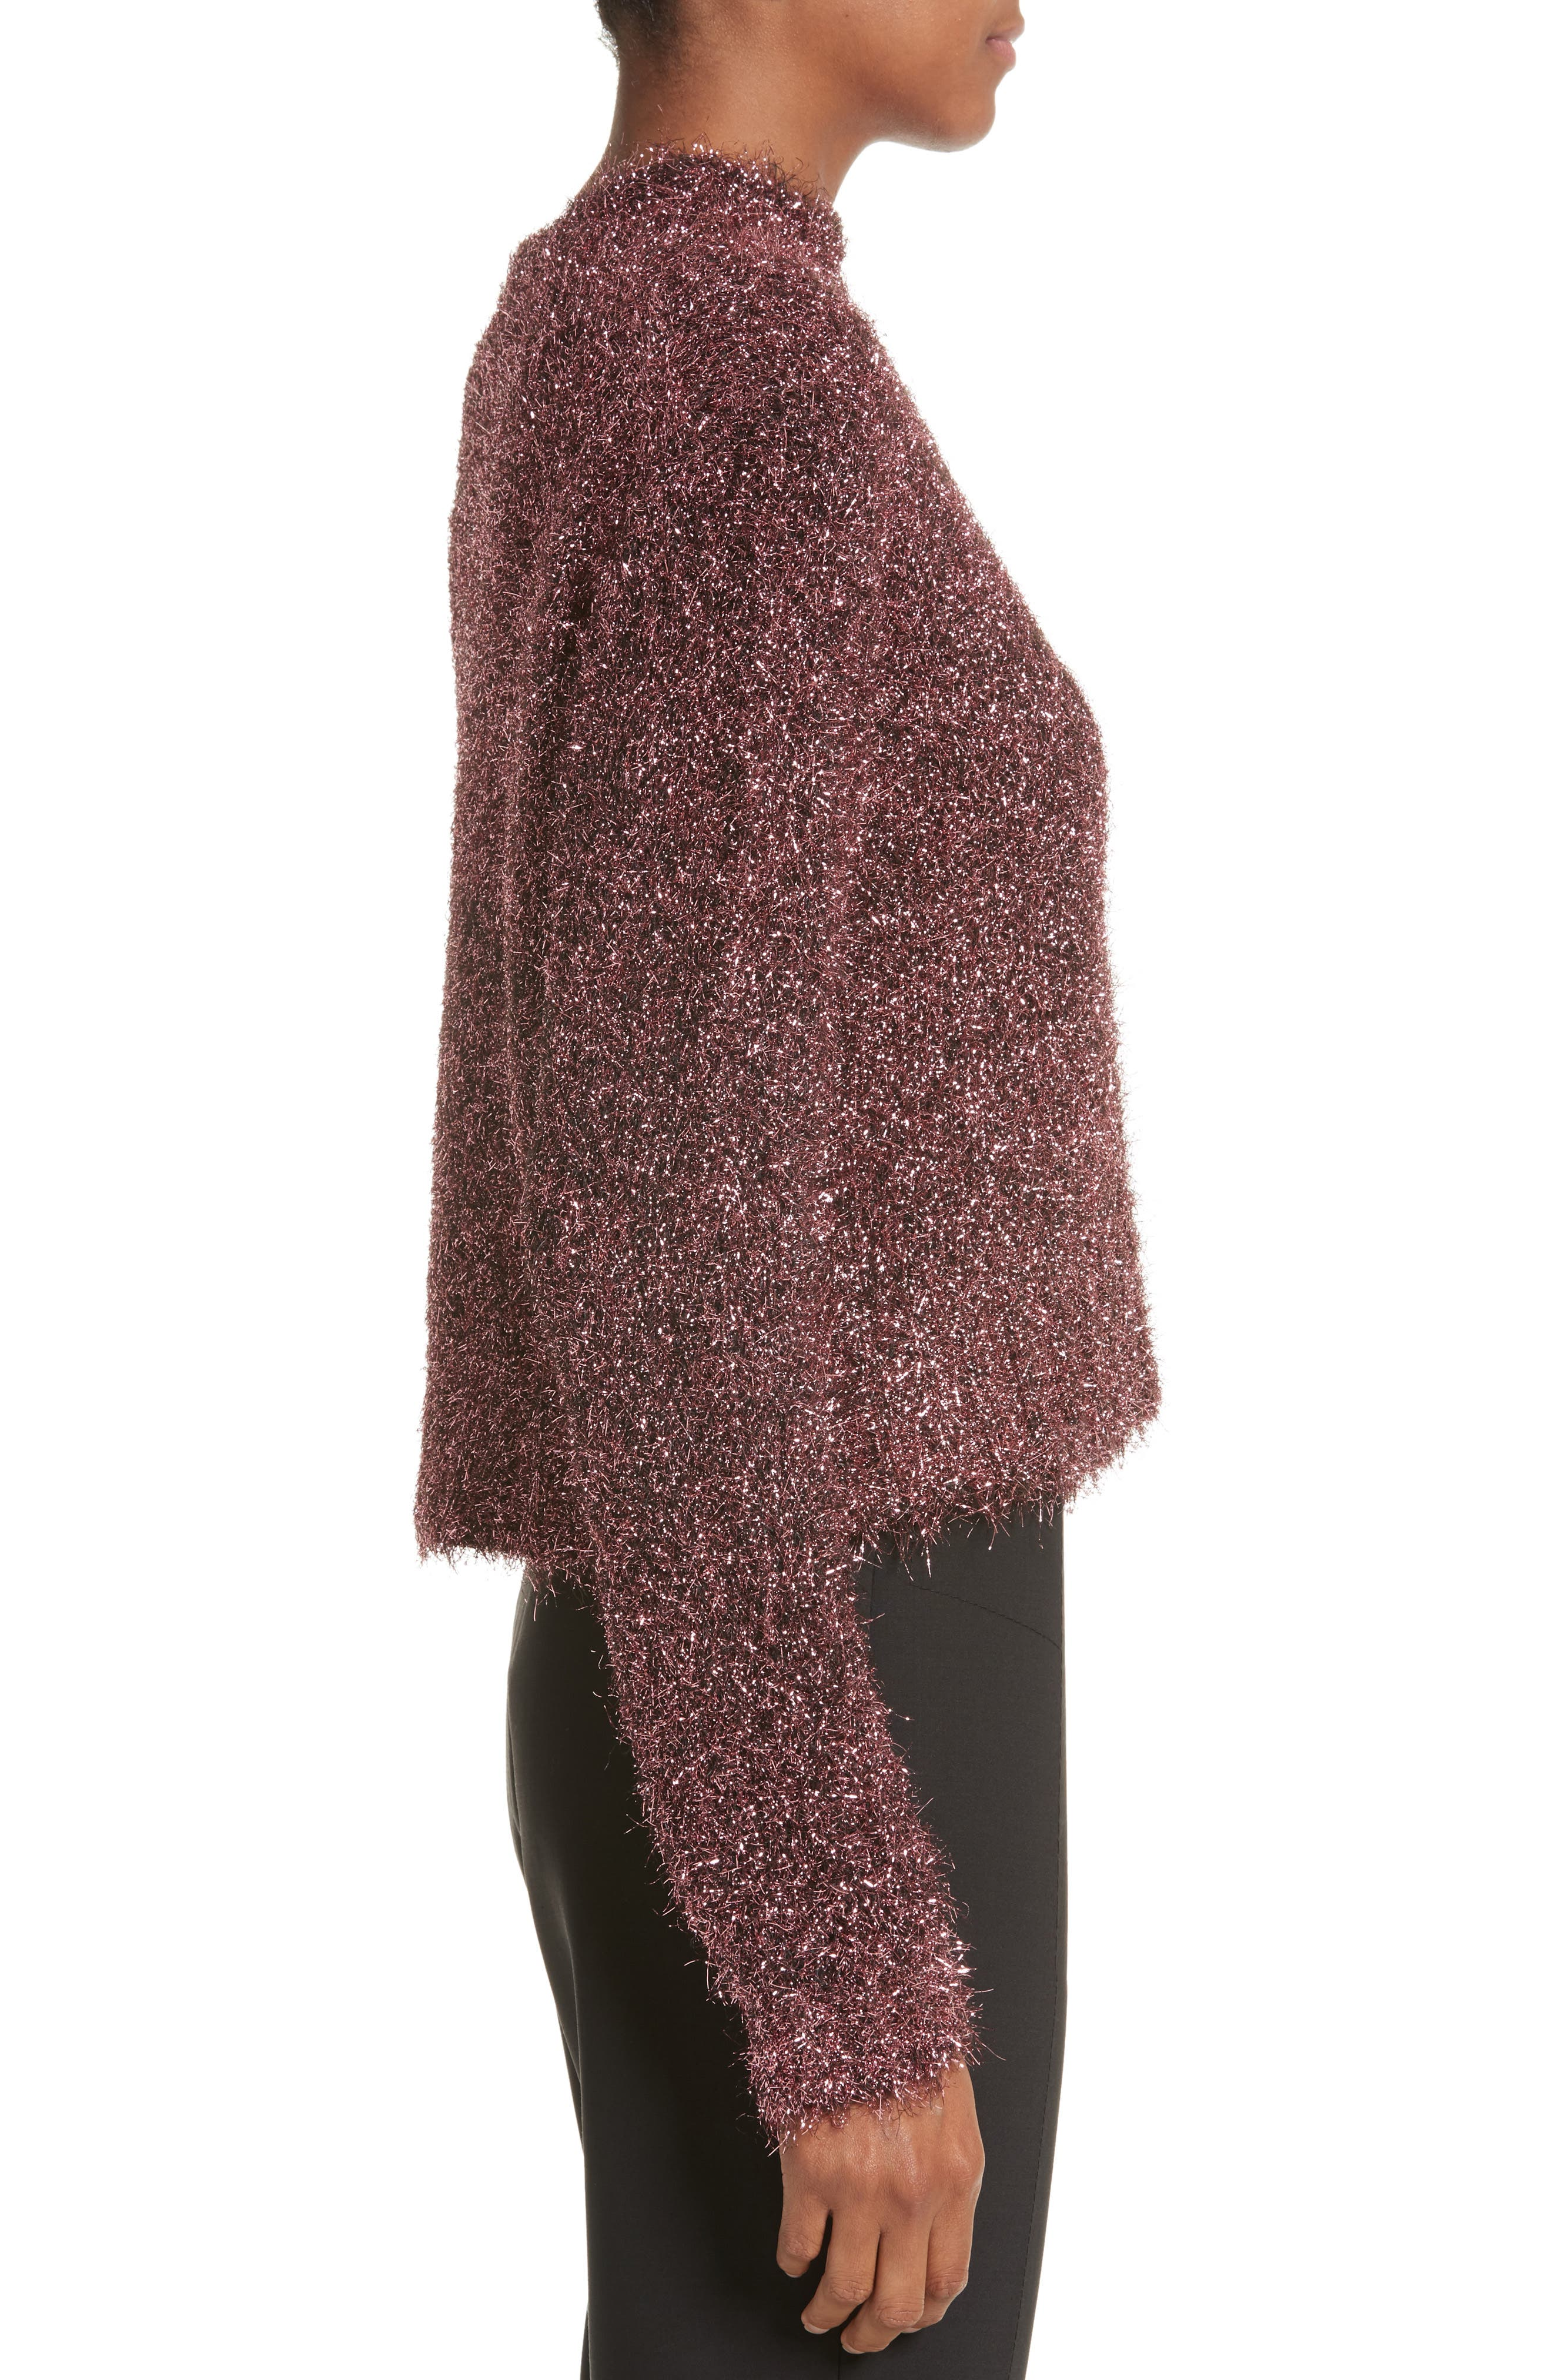 Vaporize Textured Metallic Sweater,                             Alternate thumbnail 3, color,                             650